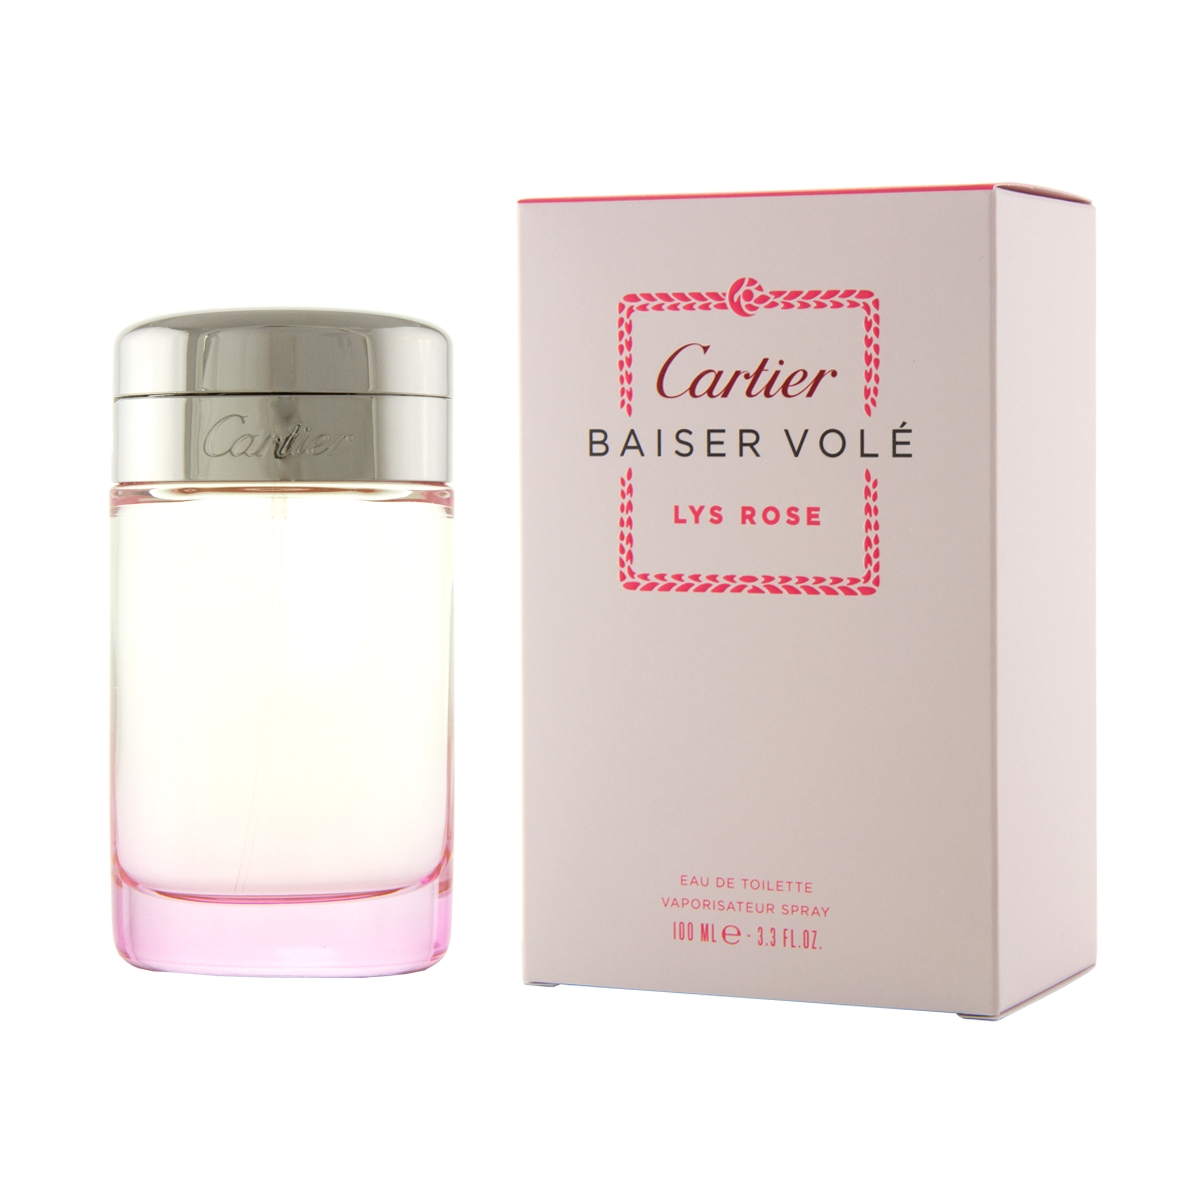 Cartier Baiser Volé Lys Rose W EDT 100ml